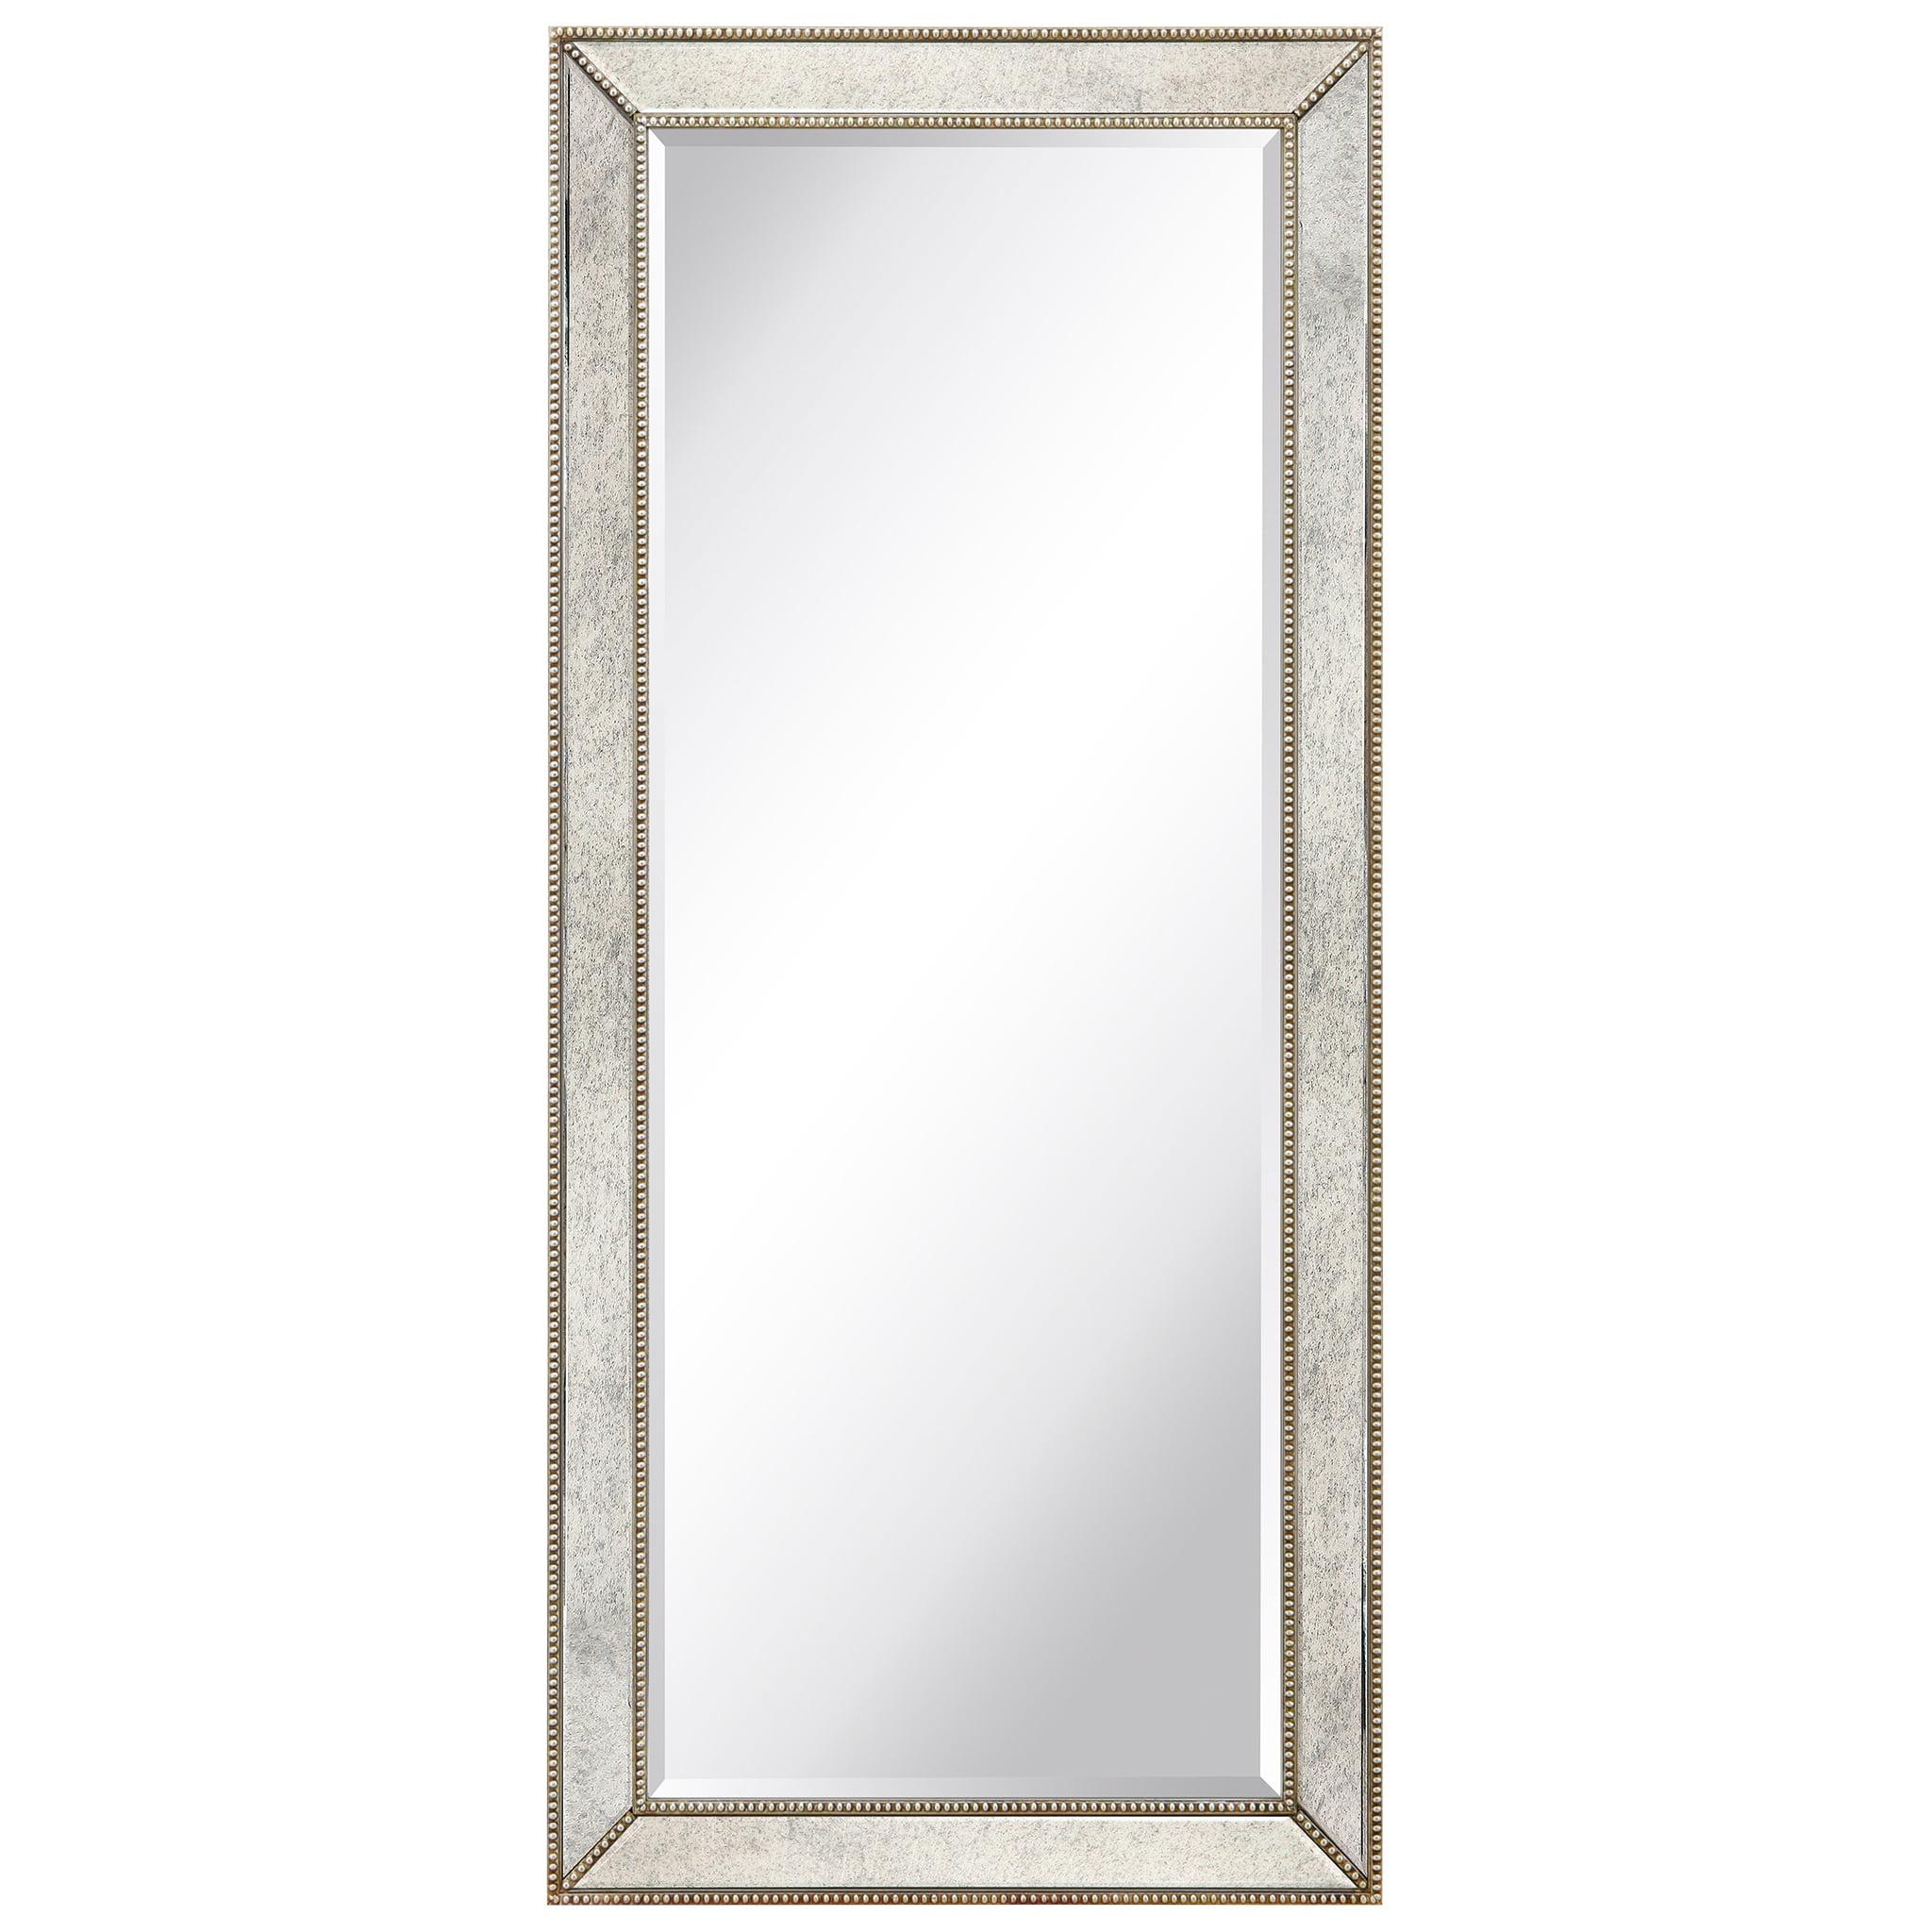 Empire Art Direct Champagne Bead Beveled Mirror 24 X 54 Ready To Hang Walmart Com Walmart Com [ 2048 x 2048 Pixel ]